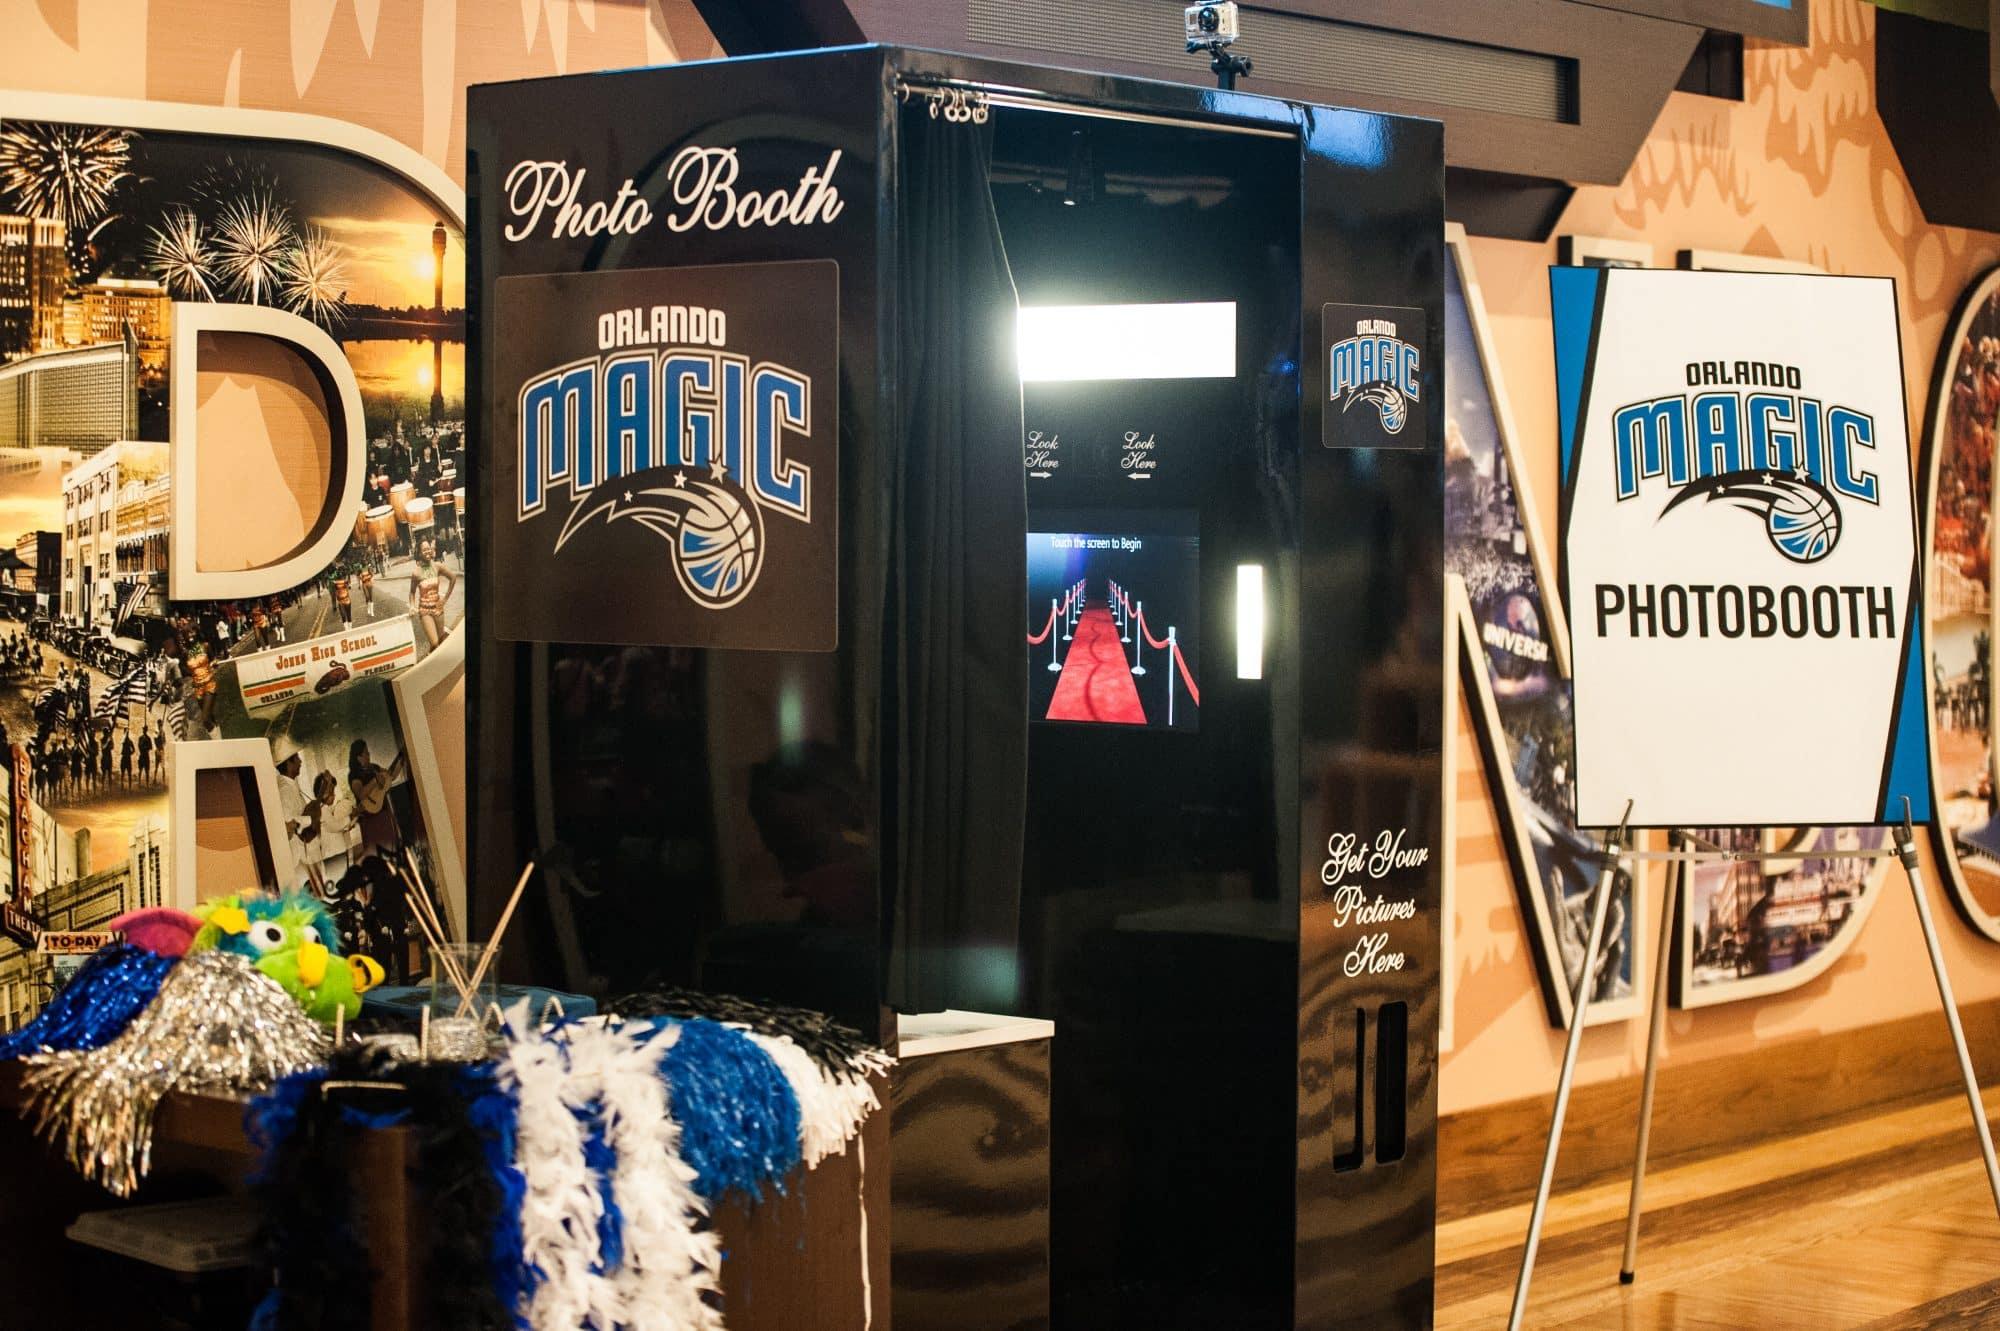 photo booth with Orlando Magic logo